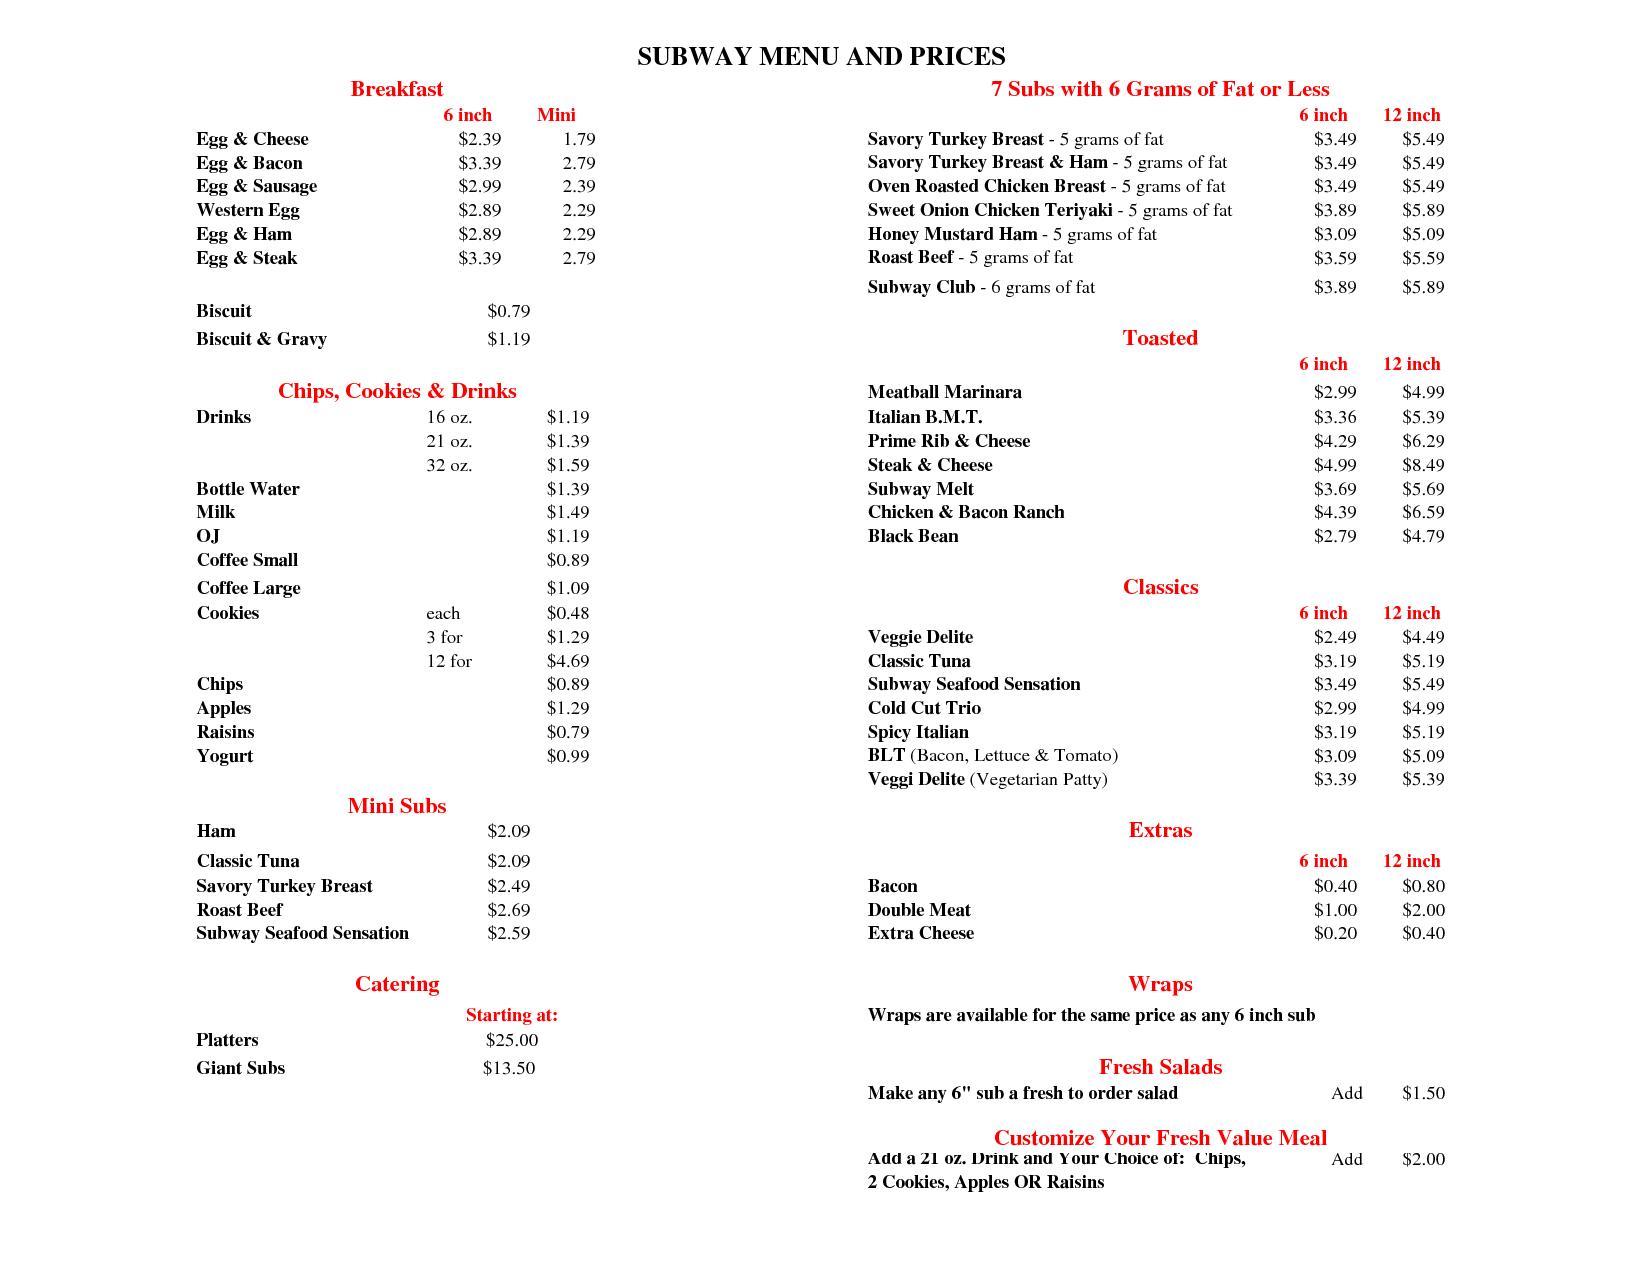 Subway Menu with Price List